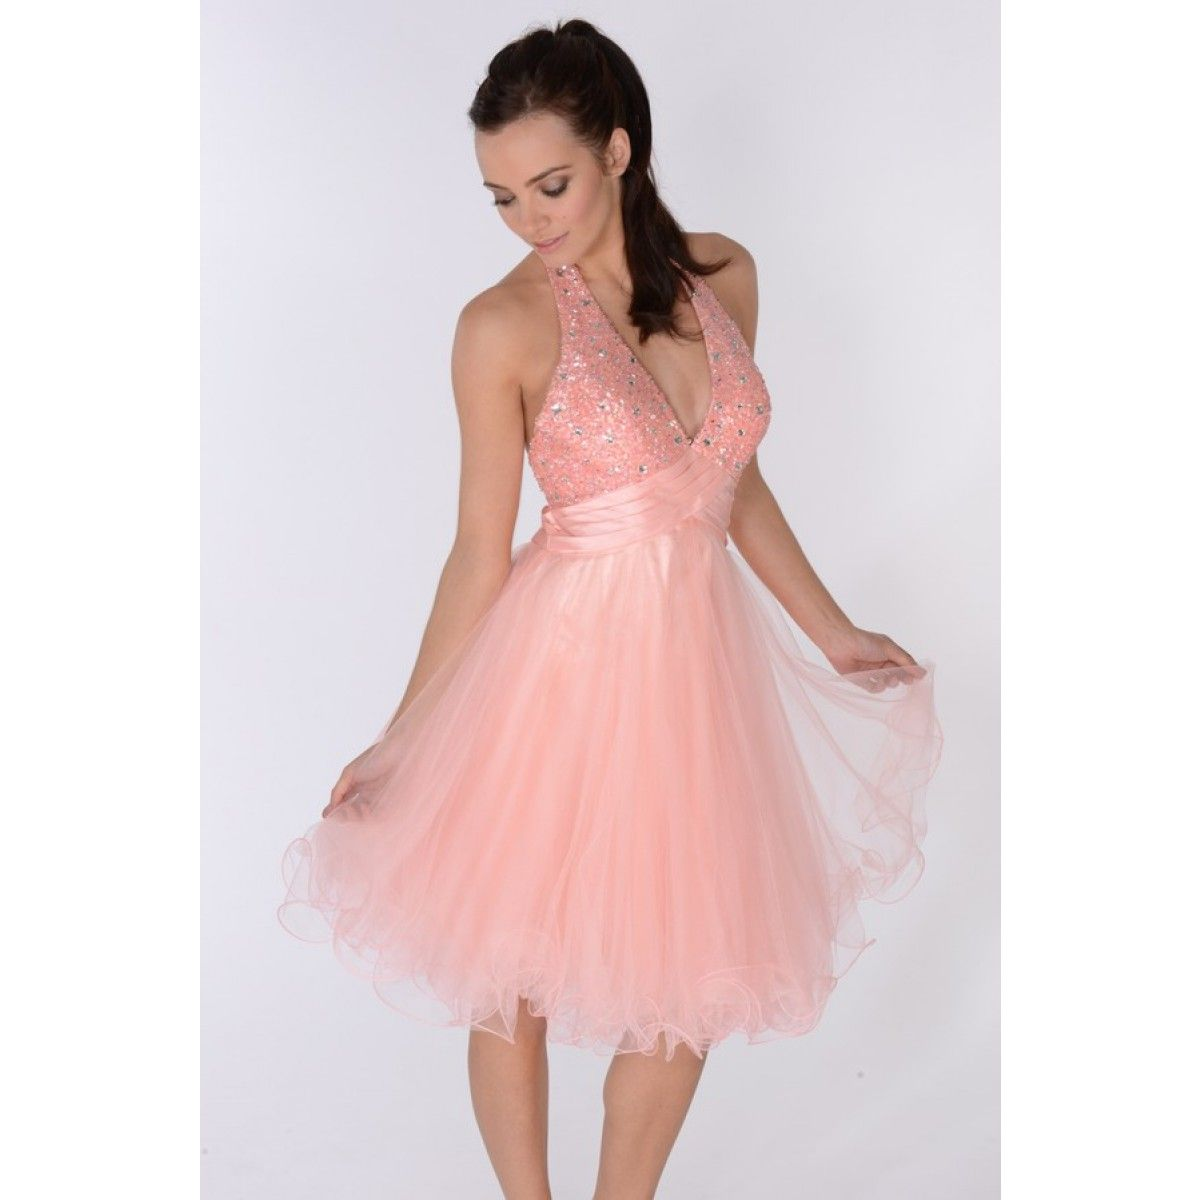 Koo-Ture peach Marilyn Monroe dress   Eloise prom queen   Pinterest ...